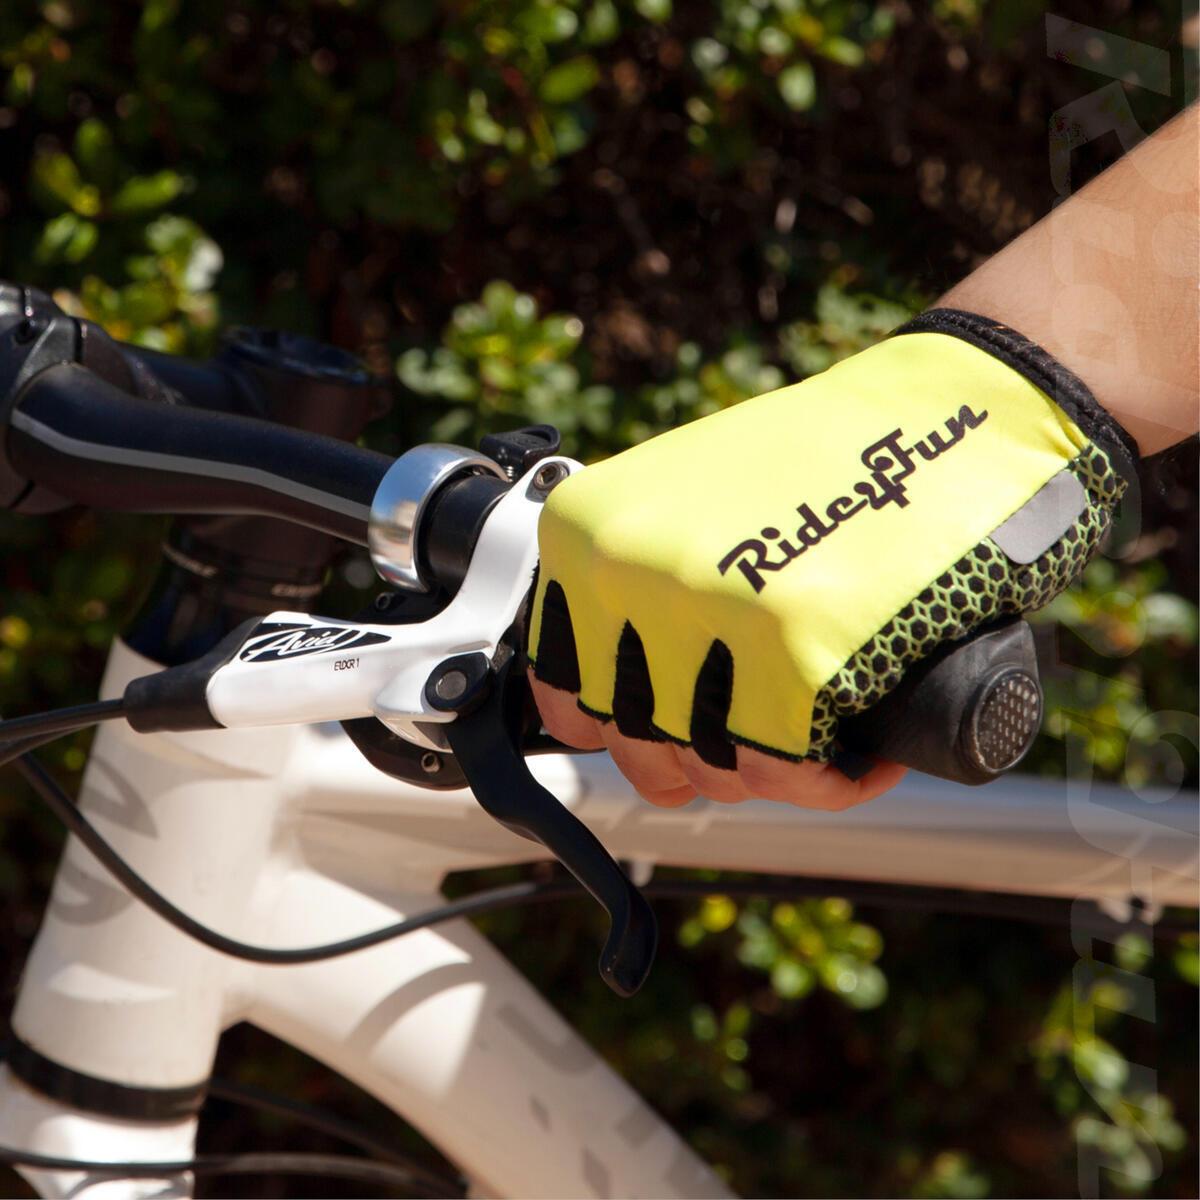 Half Finger Mountain Biking Gloves for Men. Gel Shock-Absorbing Bicycle Riding Road Bike Glove For Women. Best Fingerless Cycling Gloves for Mens / Womens